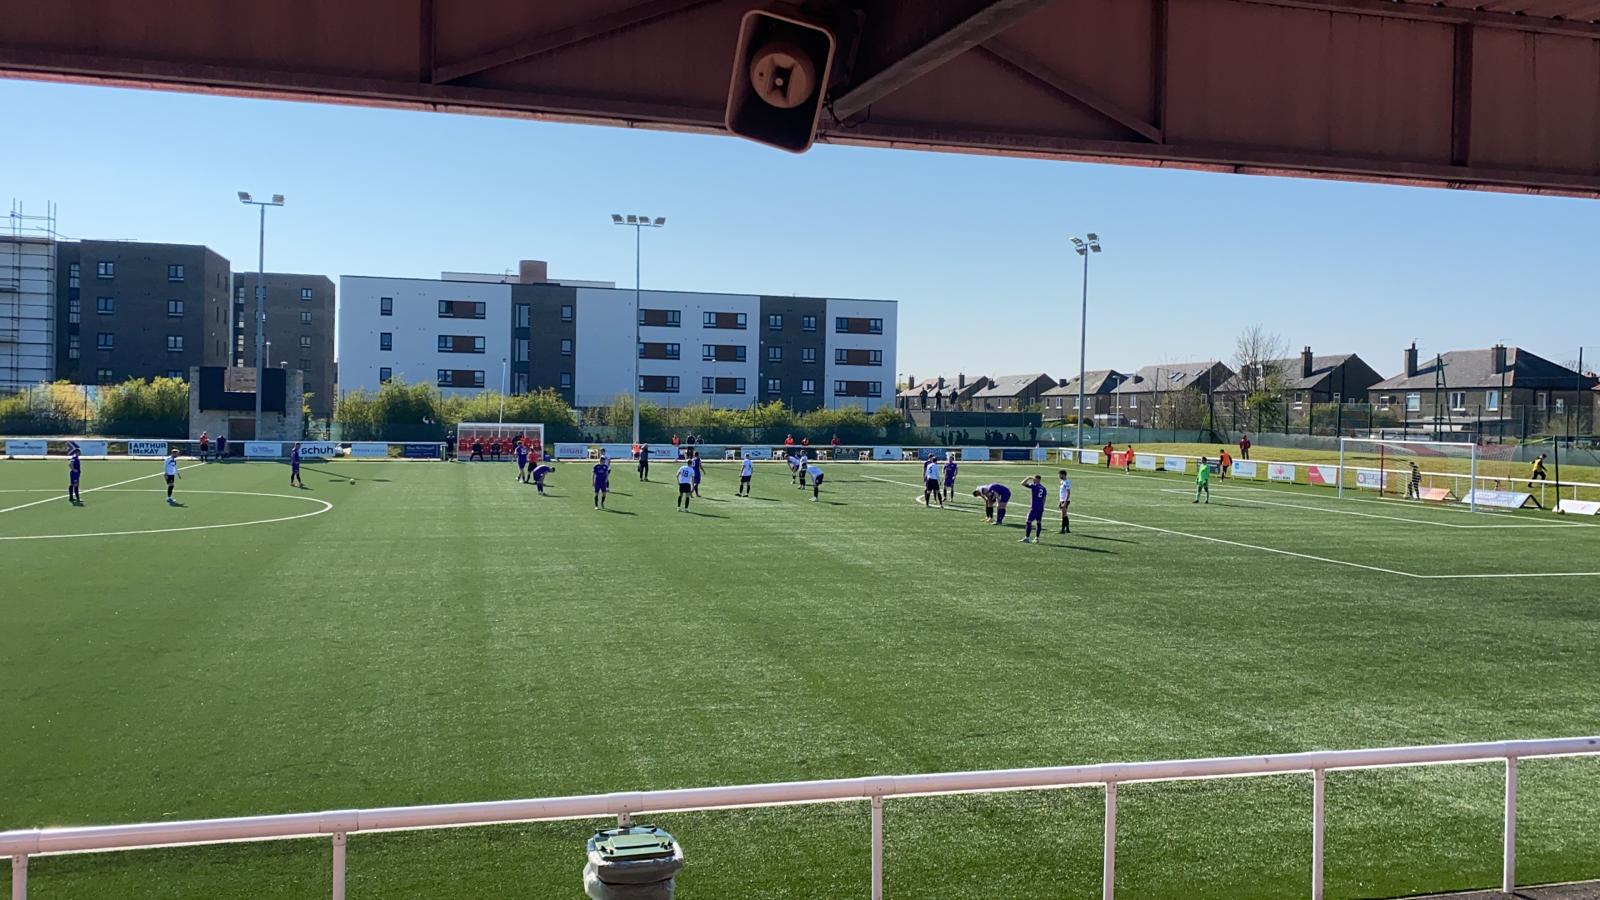 Edinburgh City v Stirling Albion preview